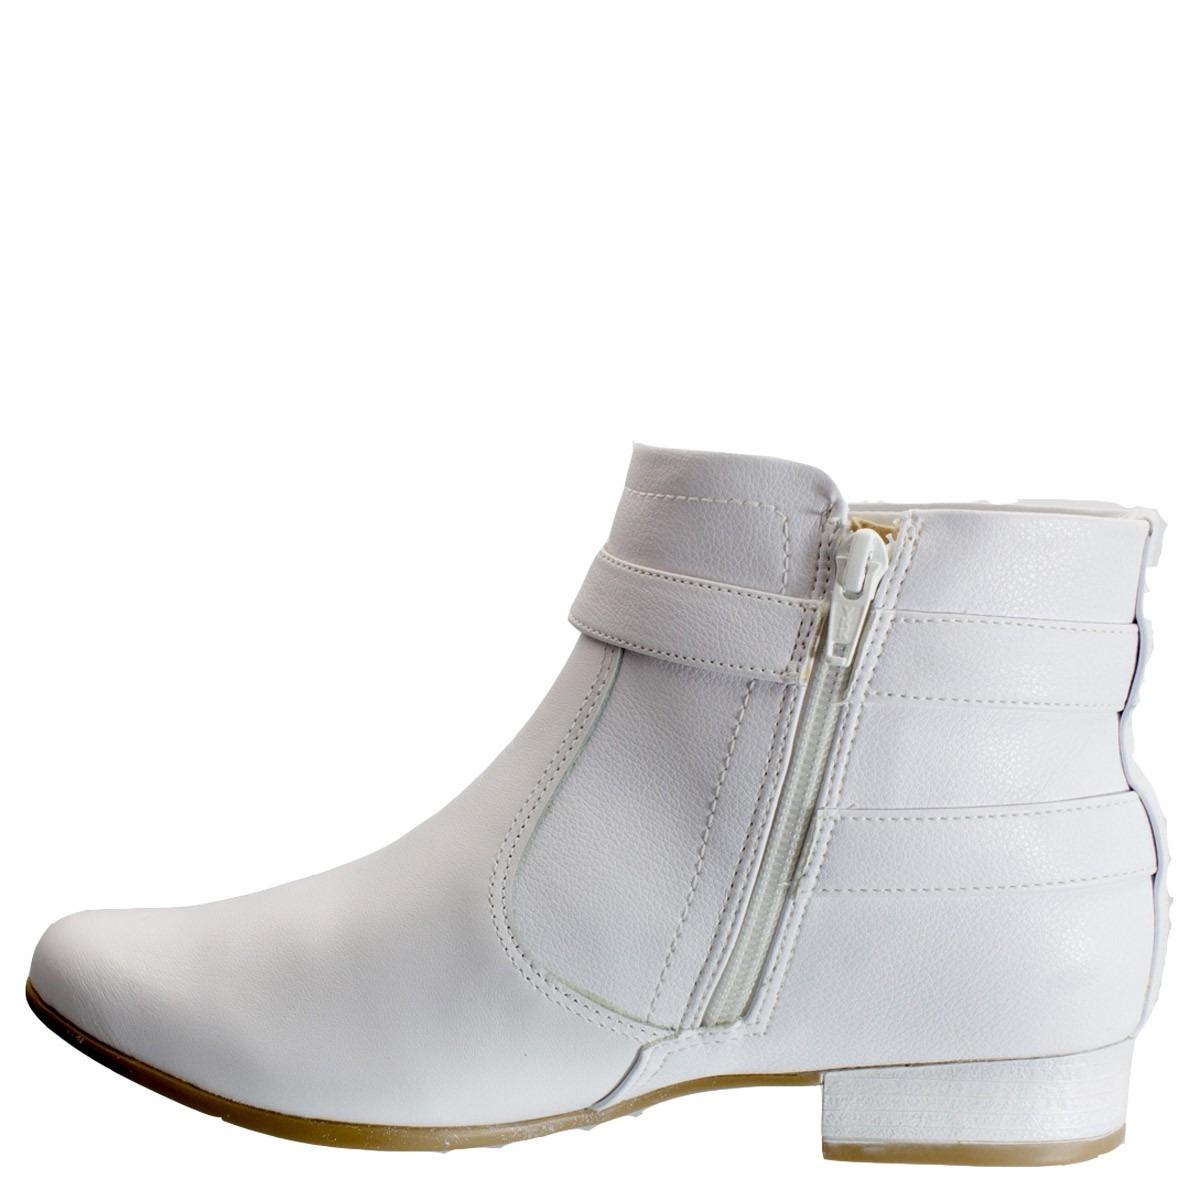 fdc45472ea bota feminina comfortflex cano curto 1790302. Carregando zoom.